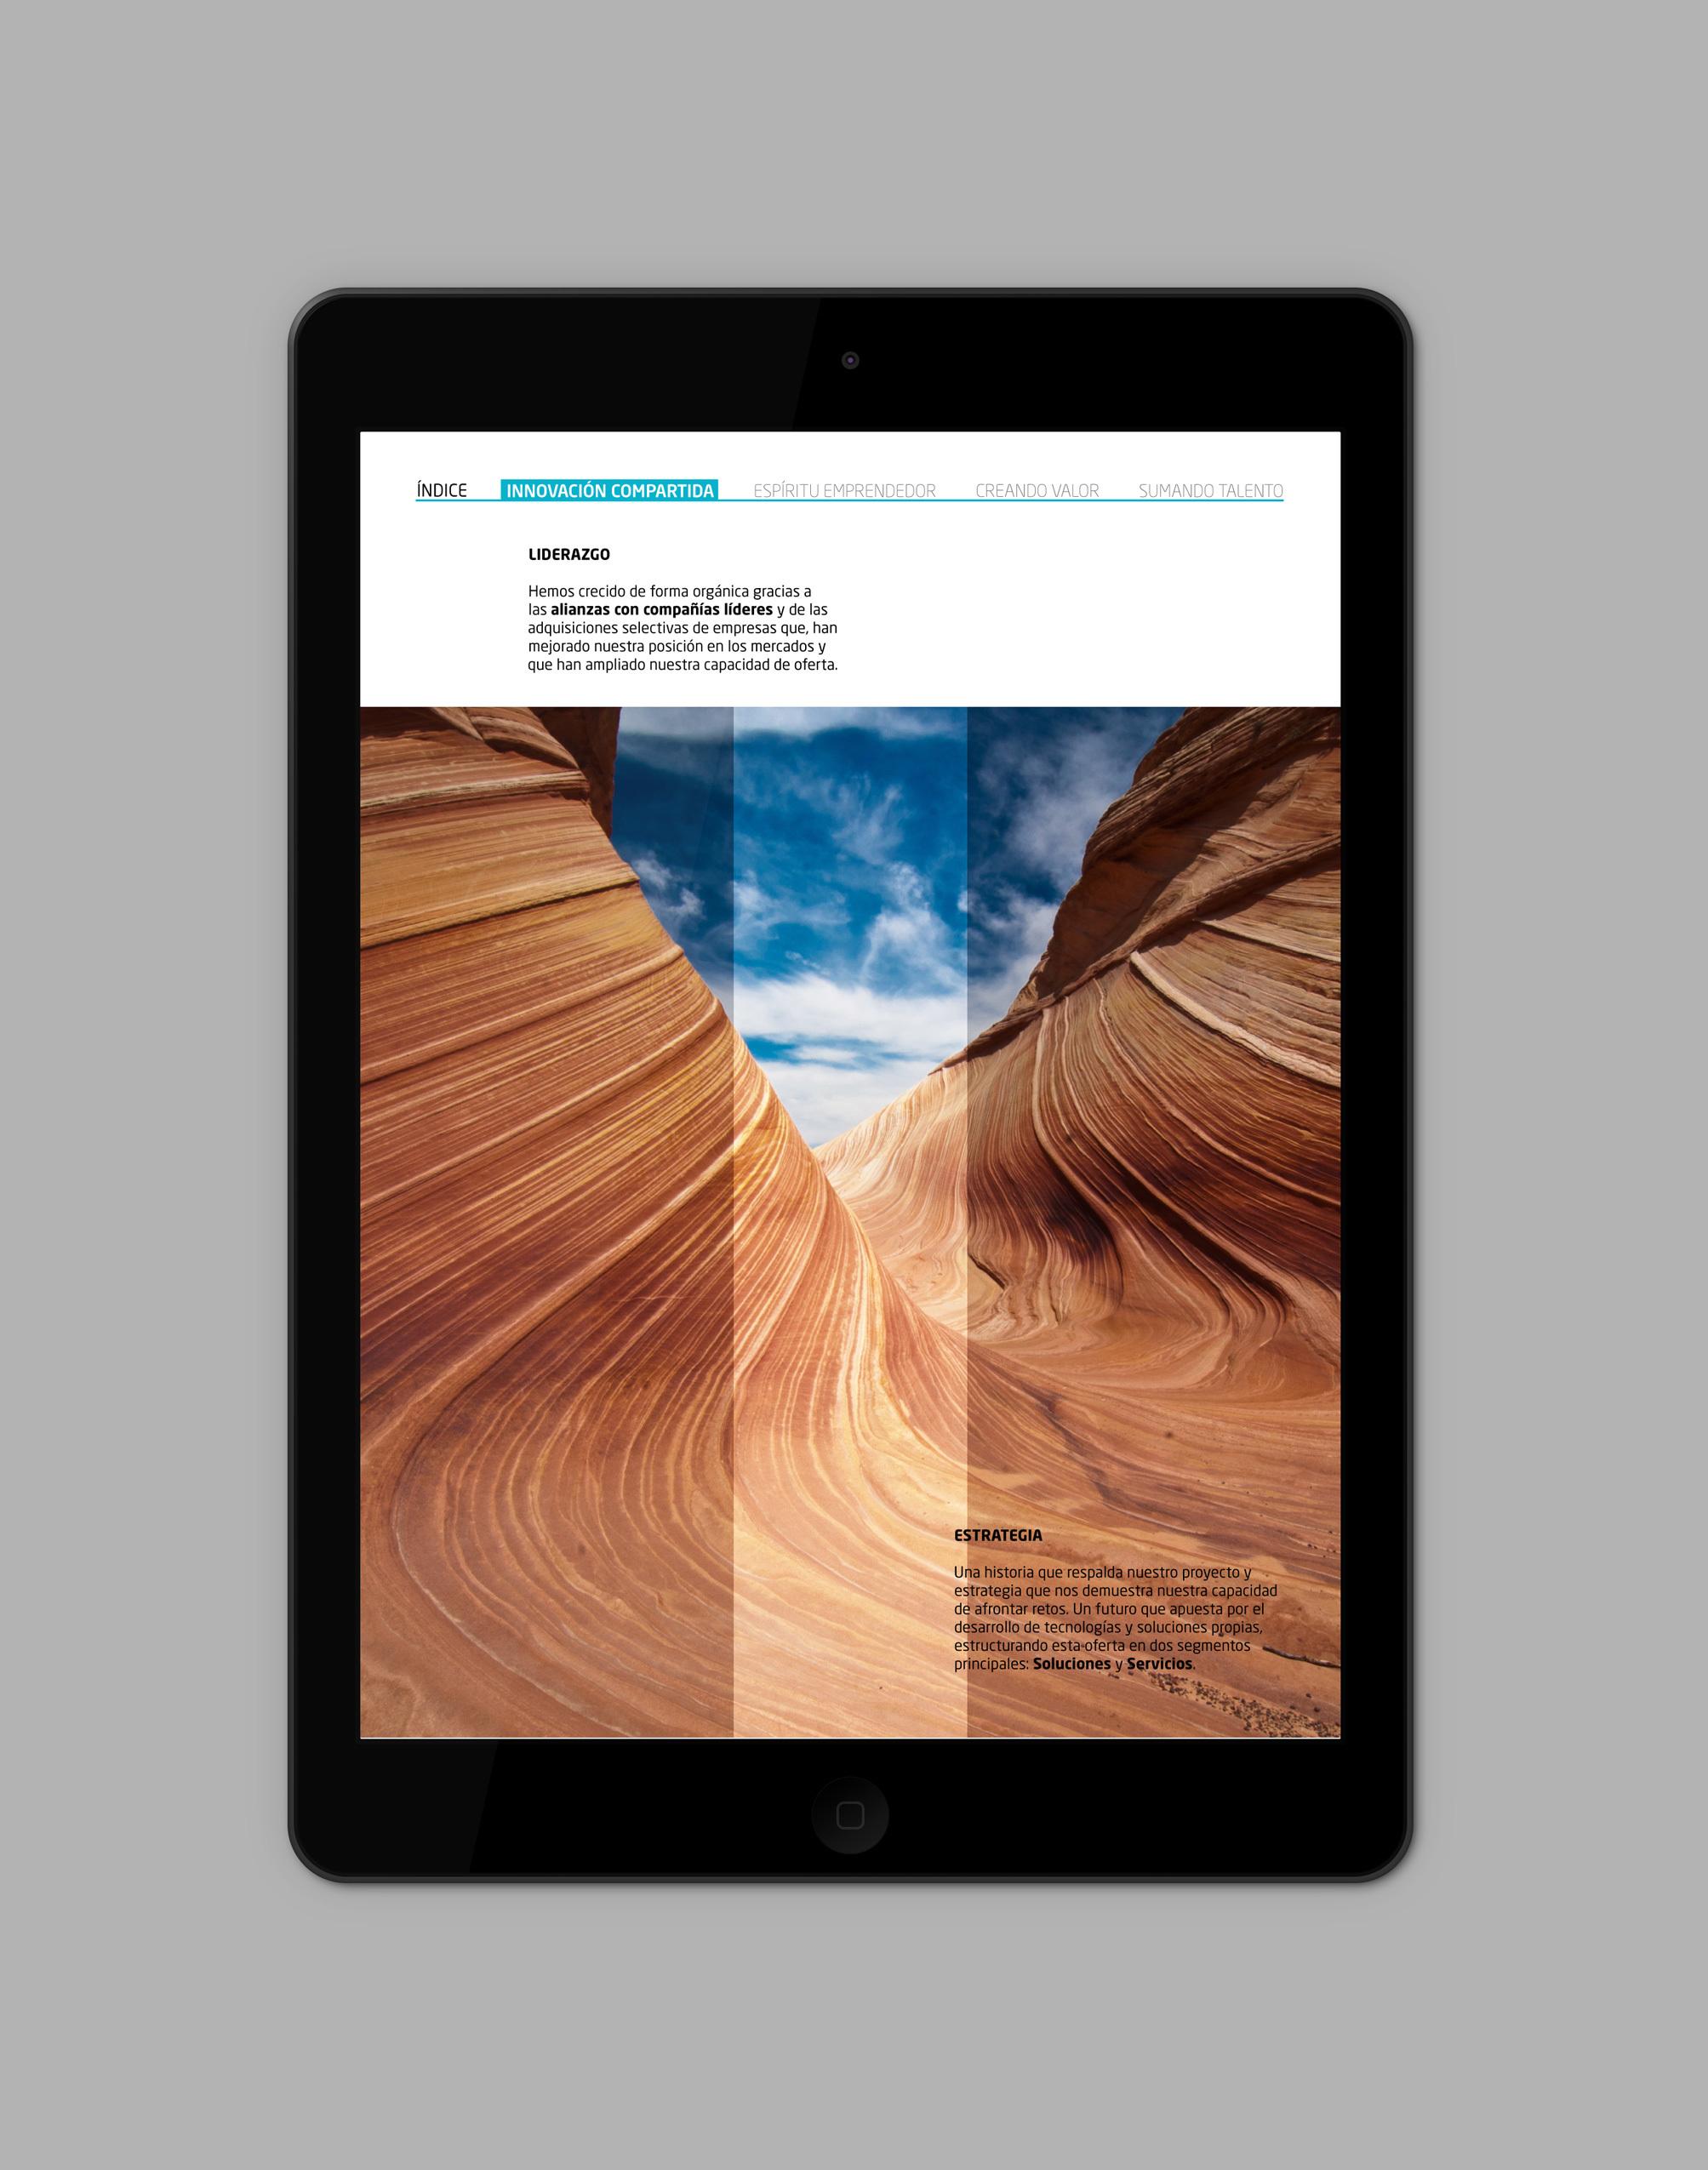 iPad-Air_Indra07.jpg